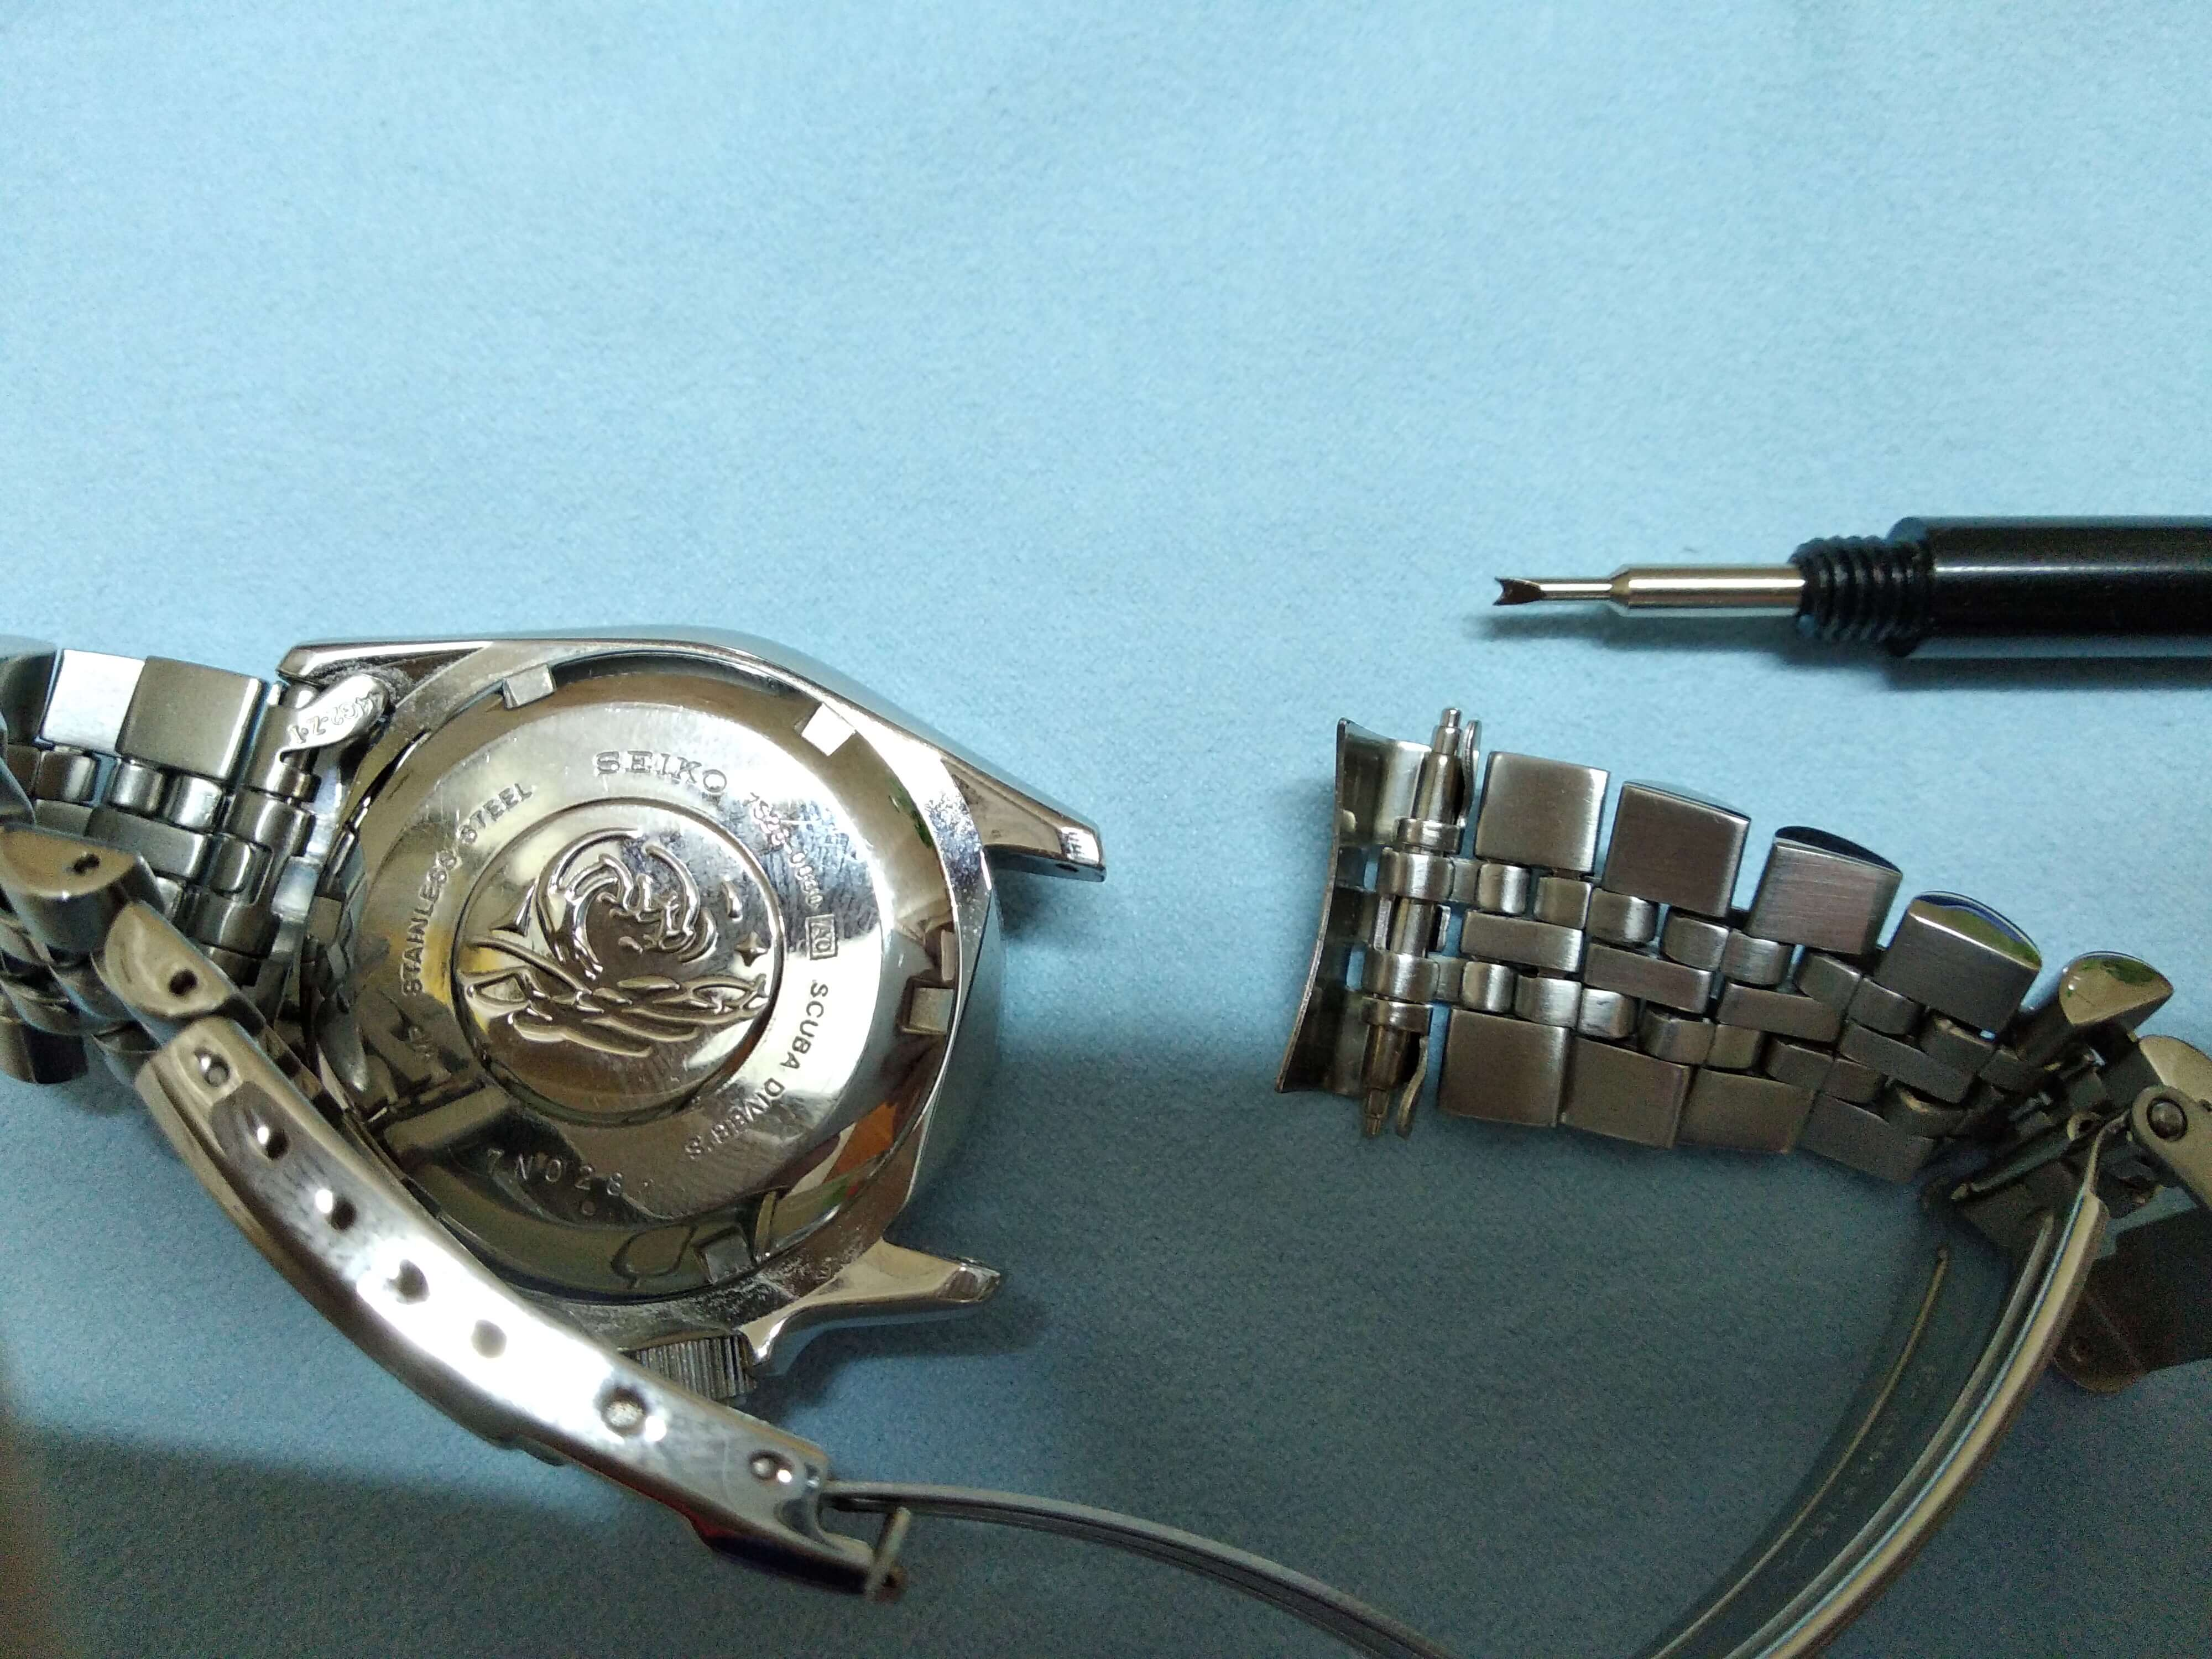 How To Adjust Seiko Bracelet